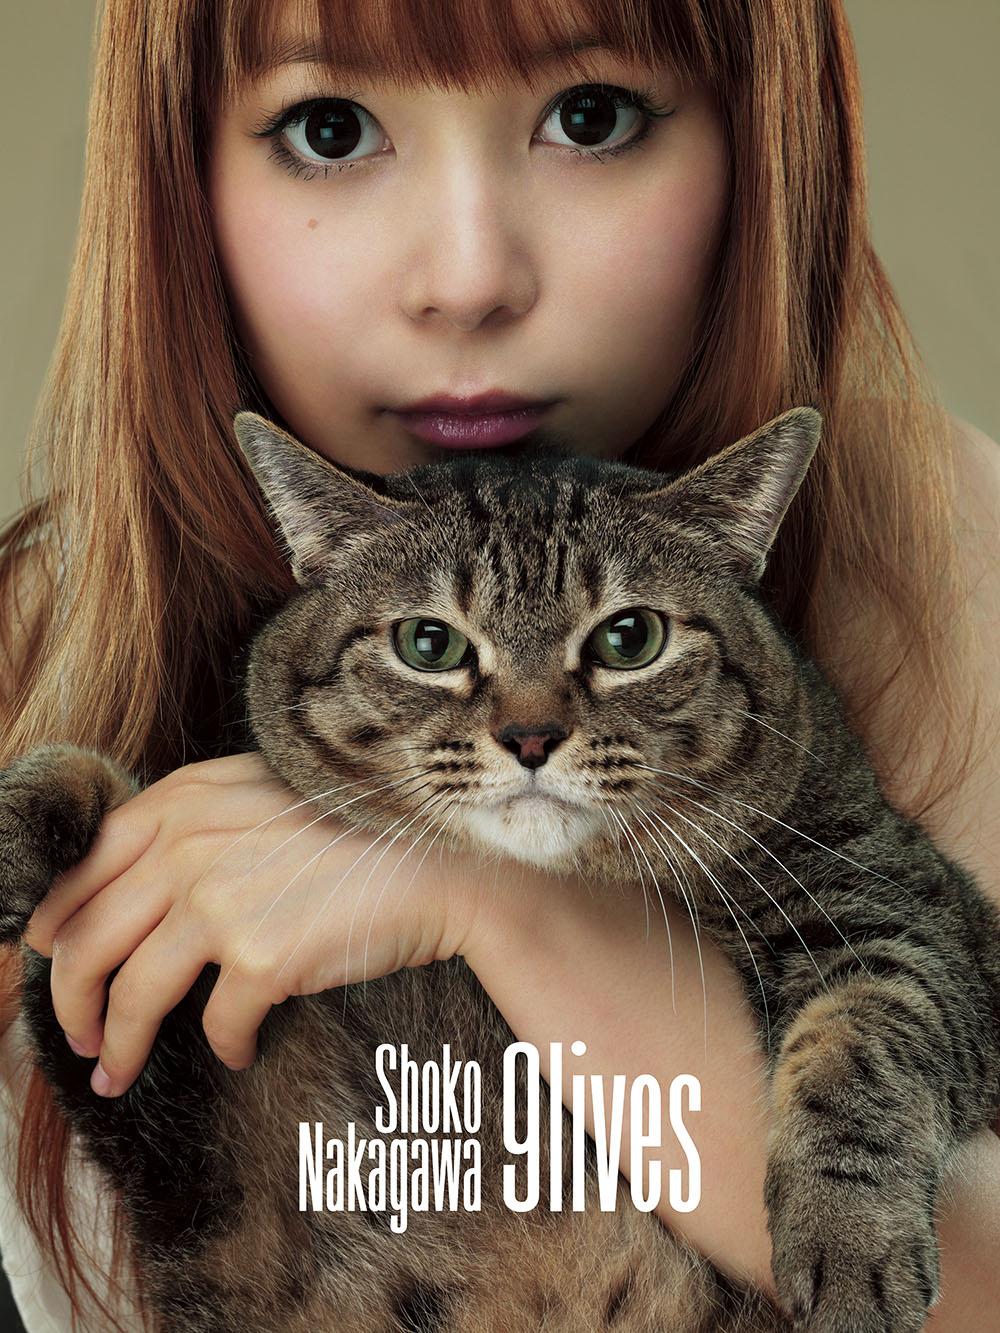 20170120.44.29 Shoko Nakagawa - 9lives cover 1.jpg